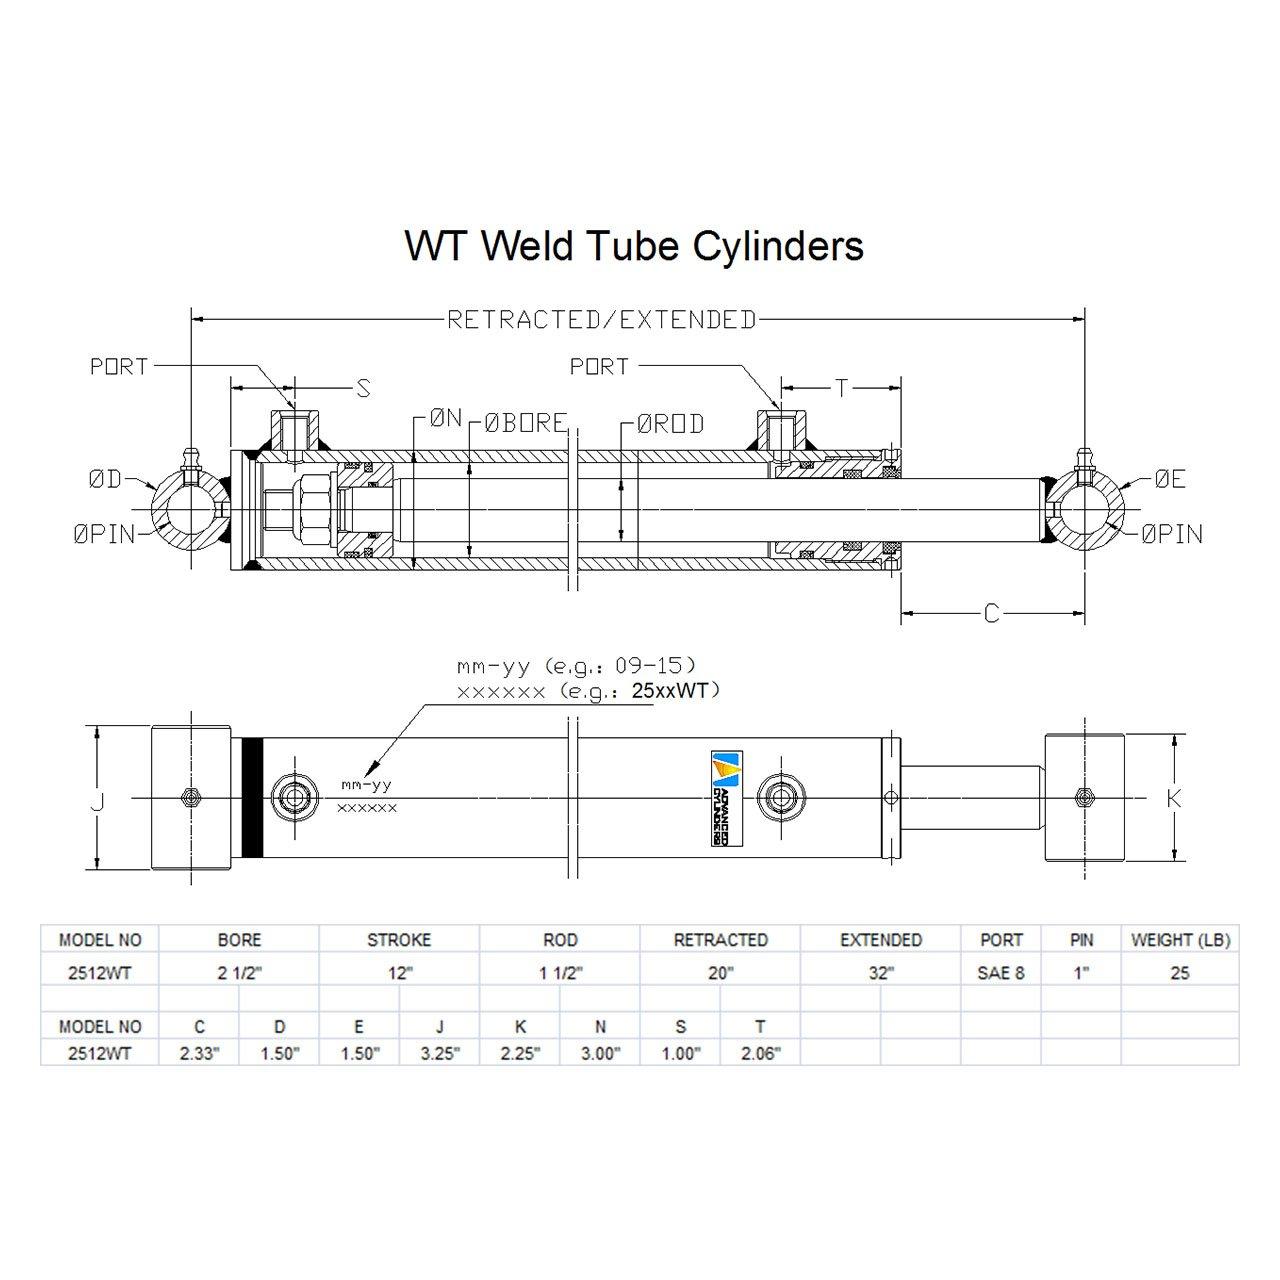 Advanced Cylinders WT Weld Cross Tube Hydraulic Cylinder 3 1//2 Bore x 40 Stroke x 1 3//4 Rod x SAE 8 Port x 3000 PSI